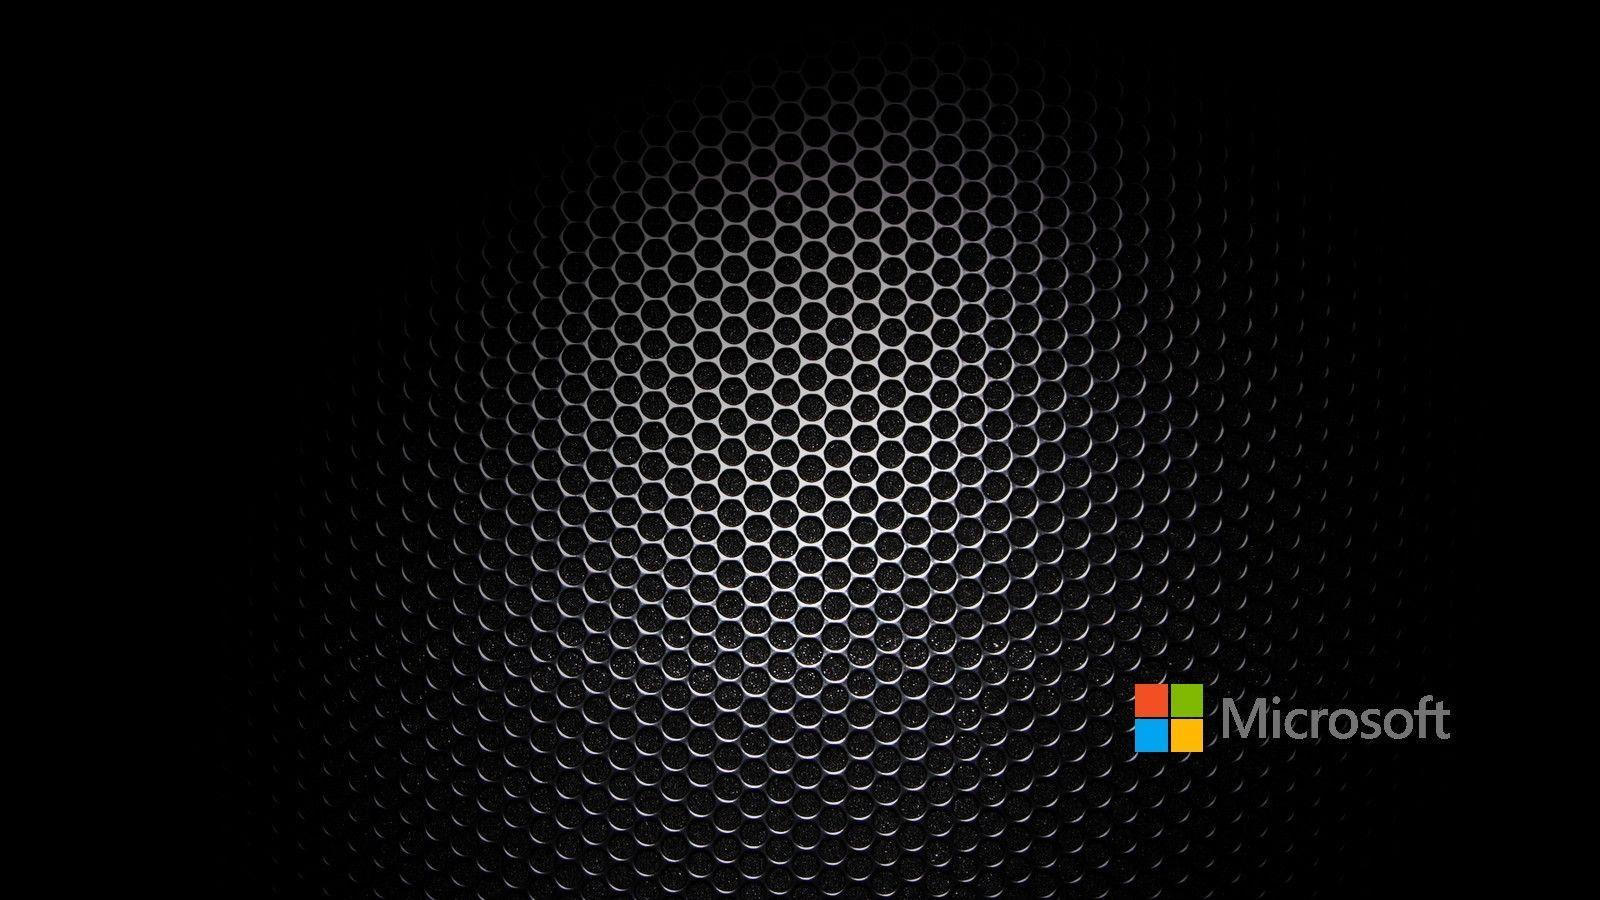 Microsoft Wallpapers  Wallpaper Cave